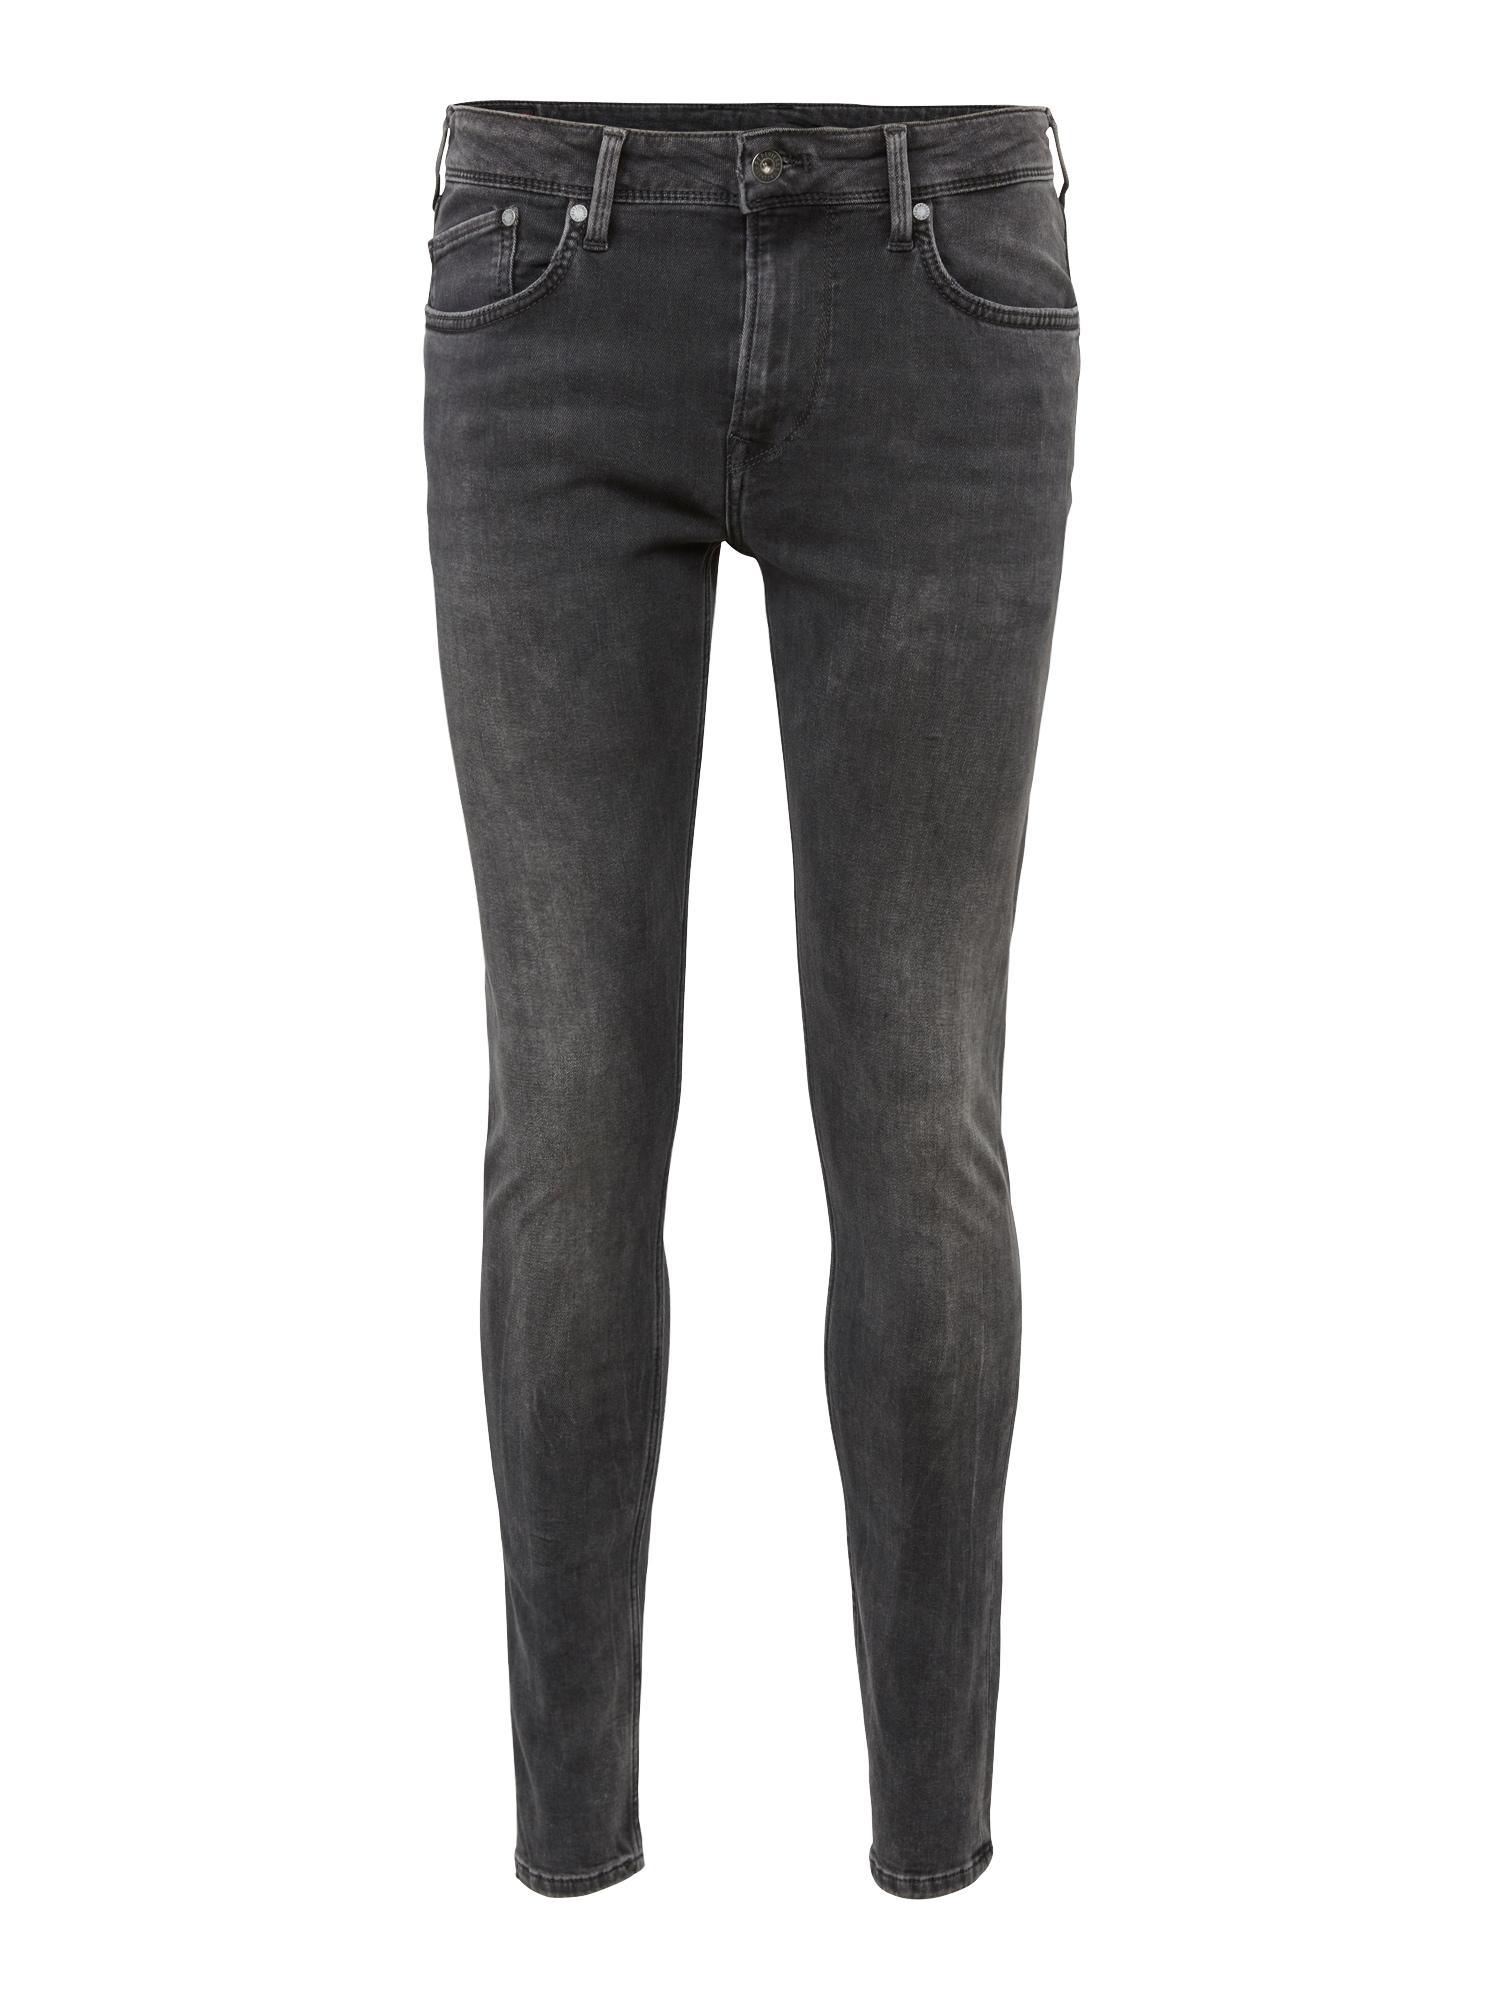 Pepe Jeans Heren Jeans Finsbury grey denim